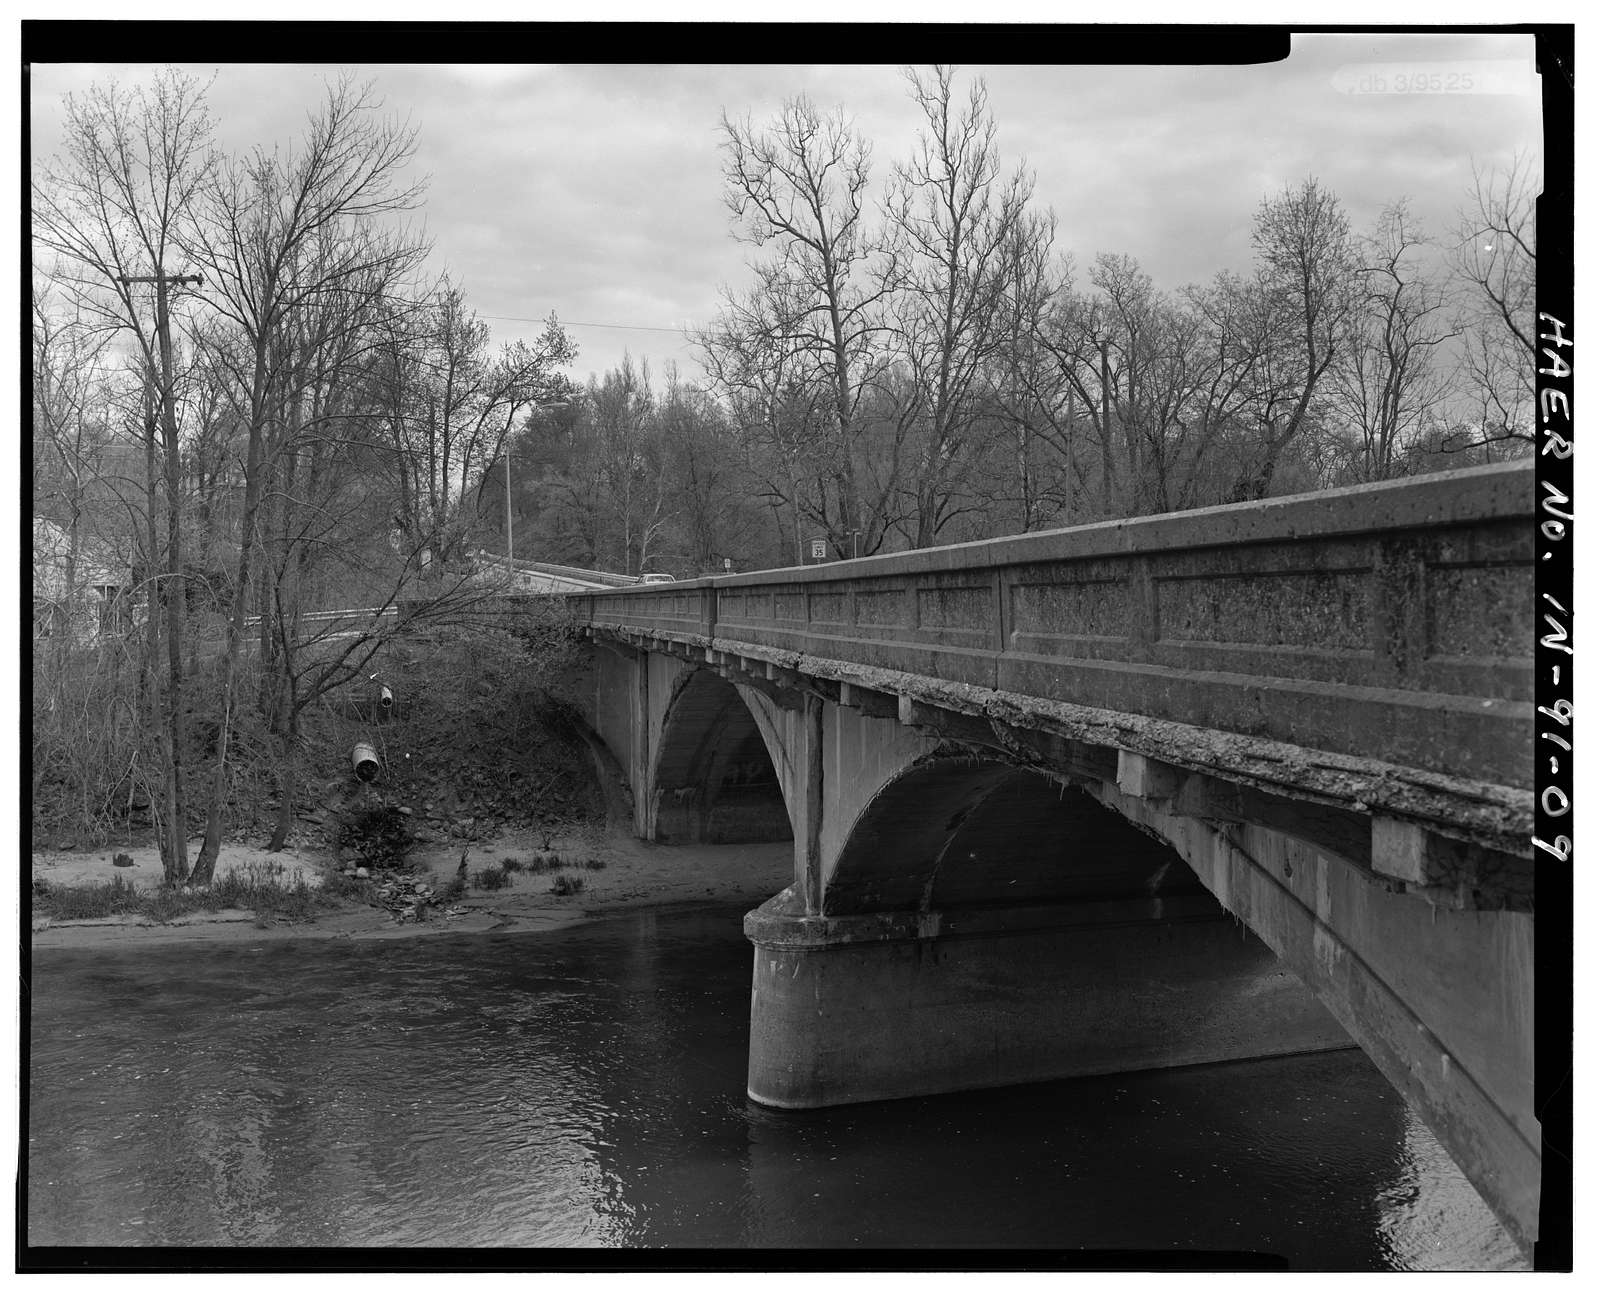 Delphi Bridge on U.S. Route 421, Spanning Deer Creek at U.S. Route 421, Delphi, Carroll County, IN